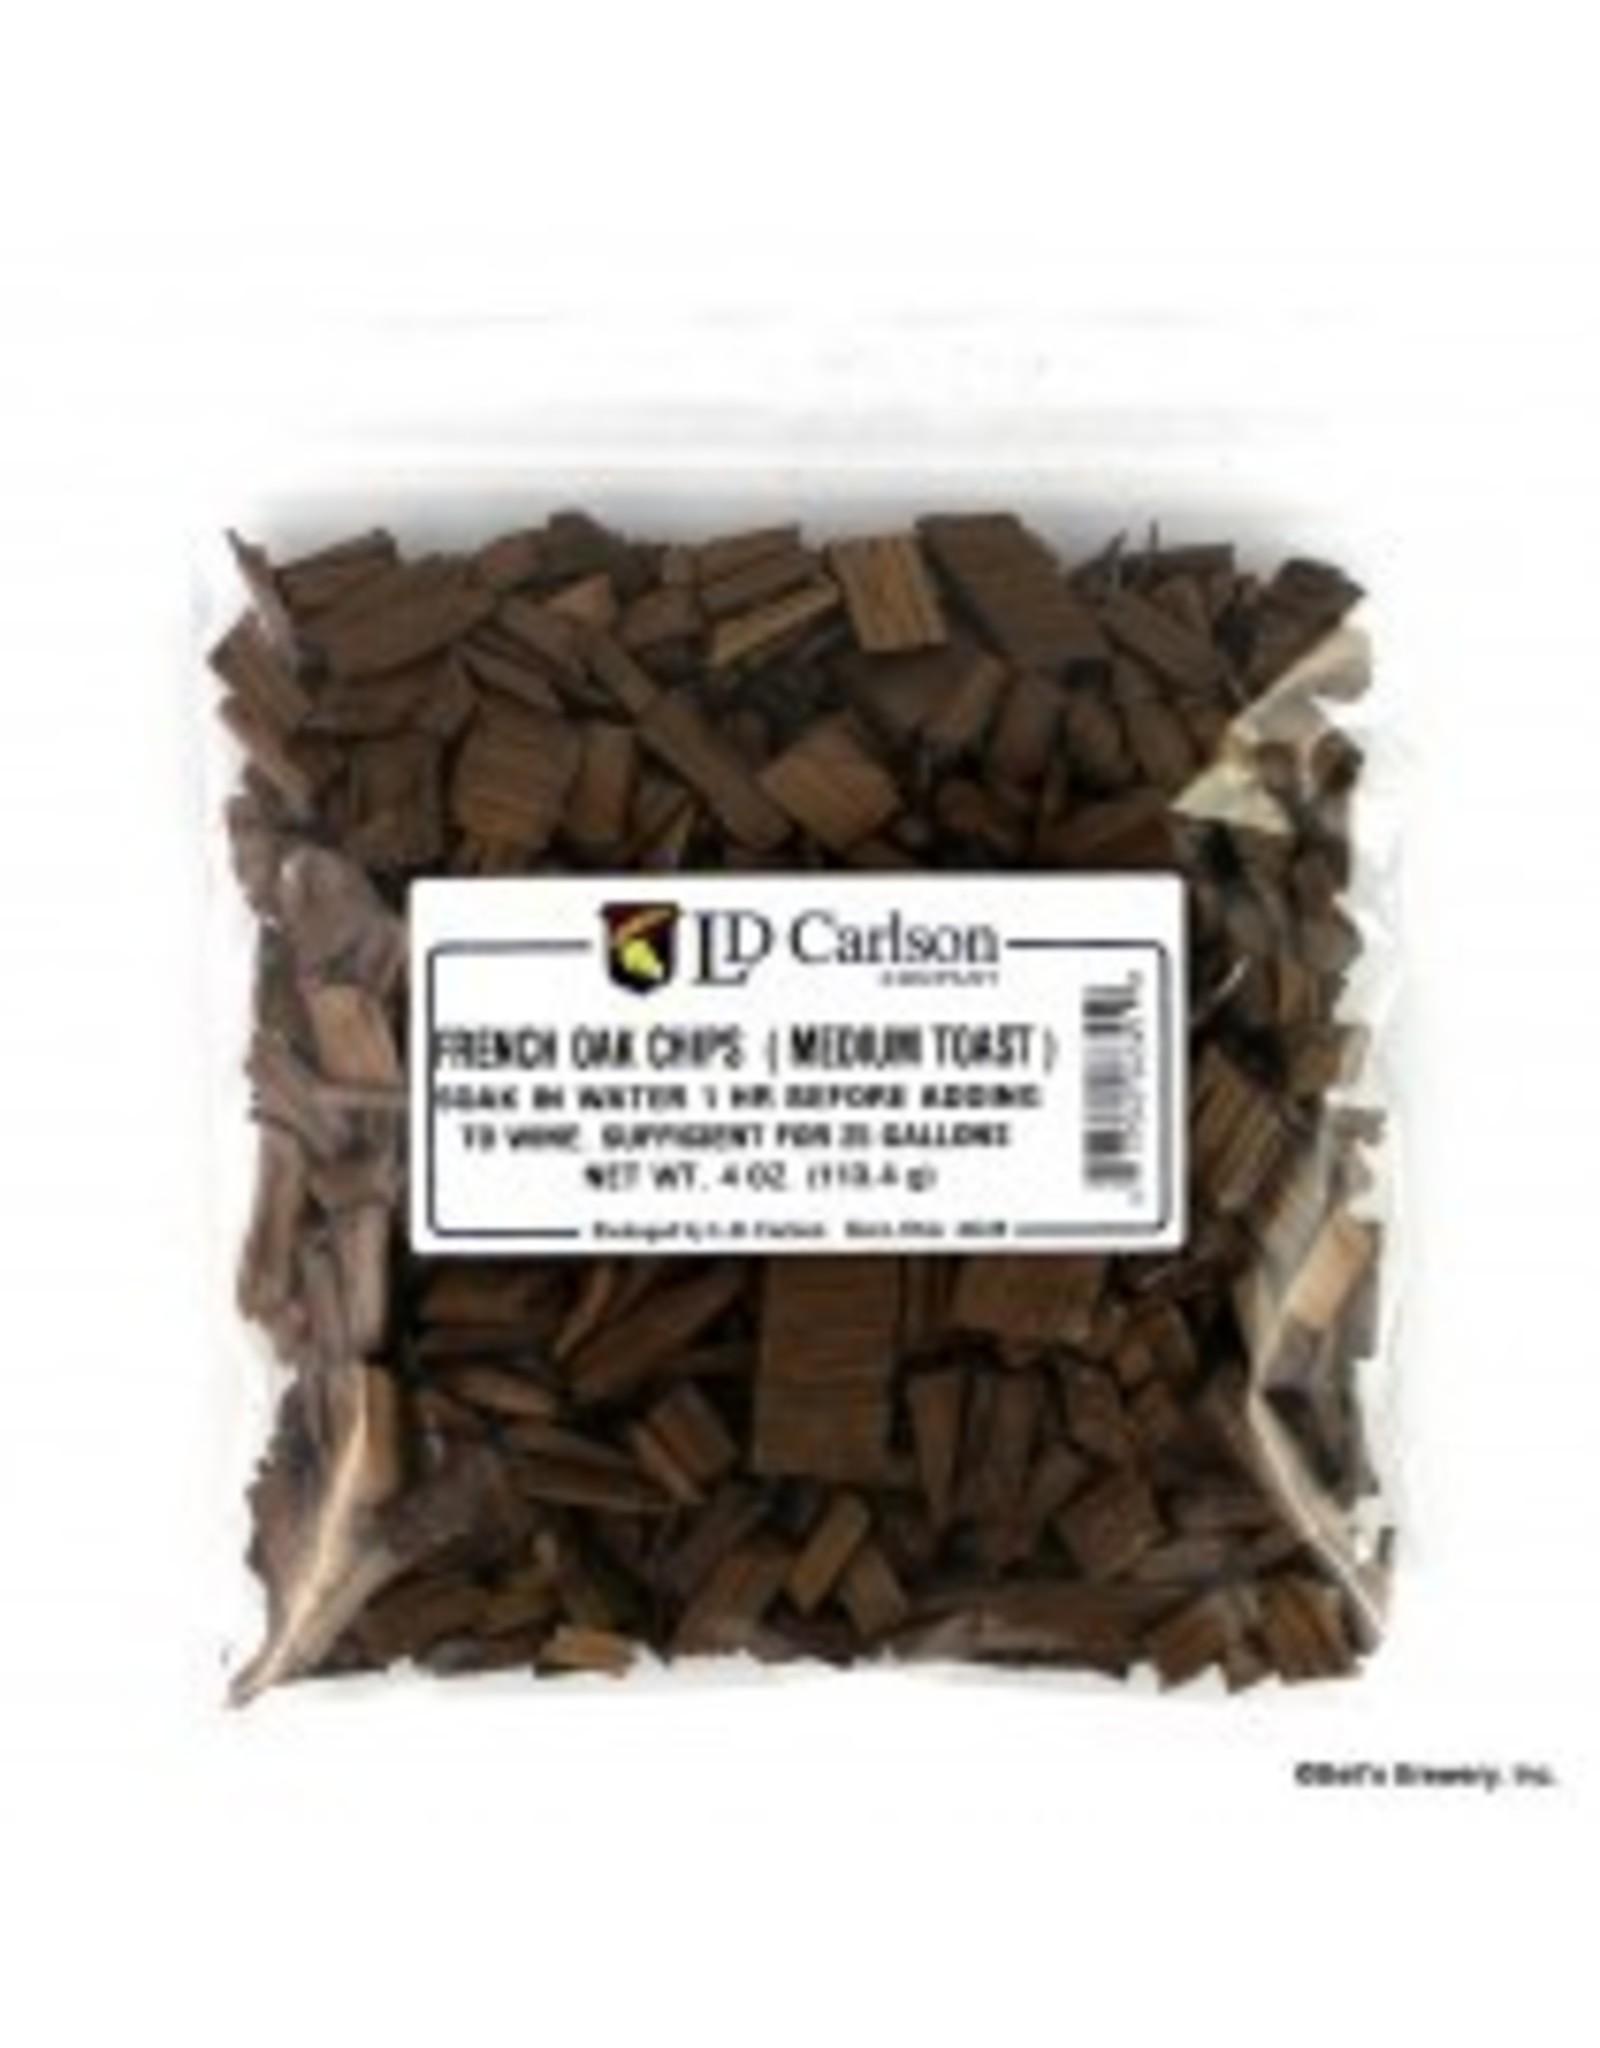 French Oak Chips Medium Toast 4oz